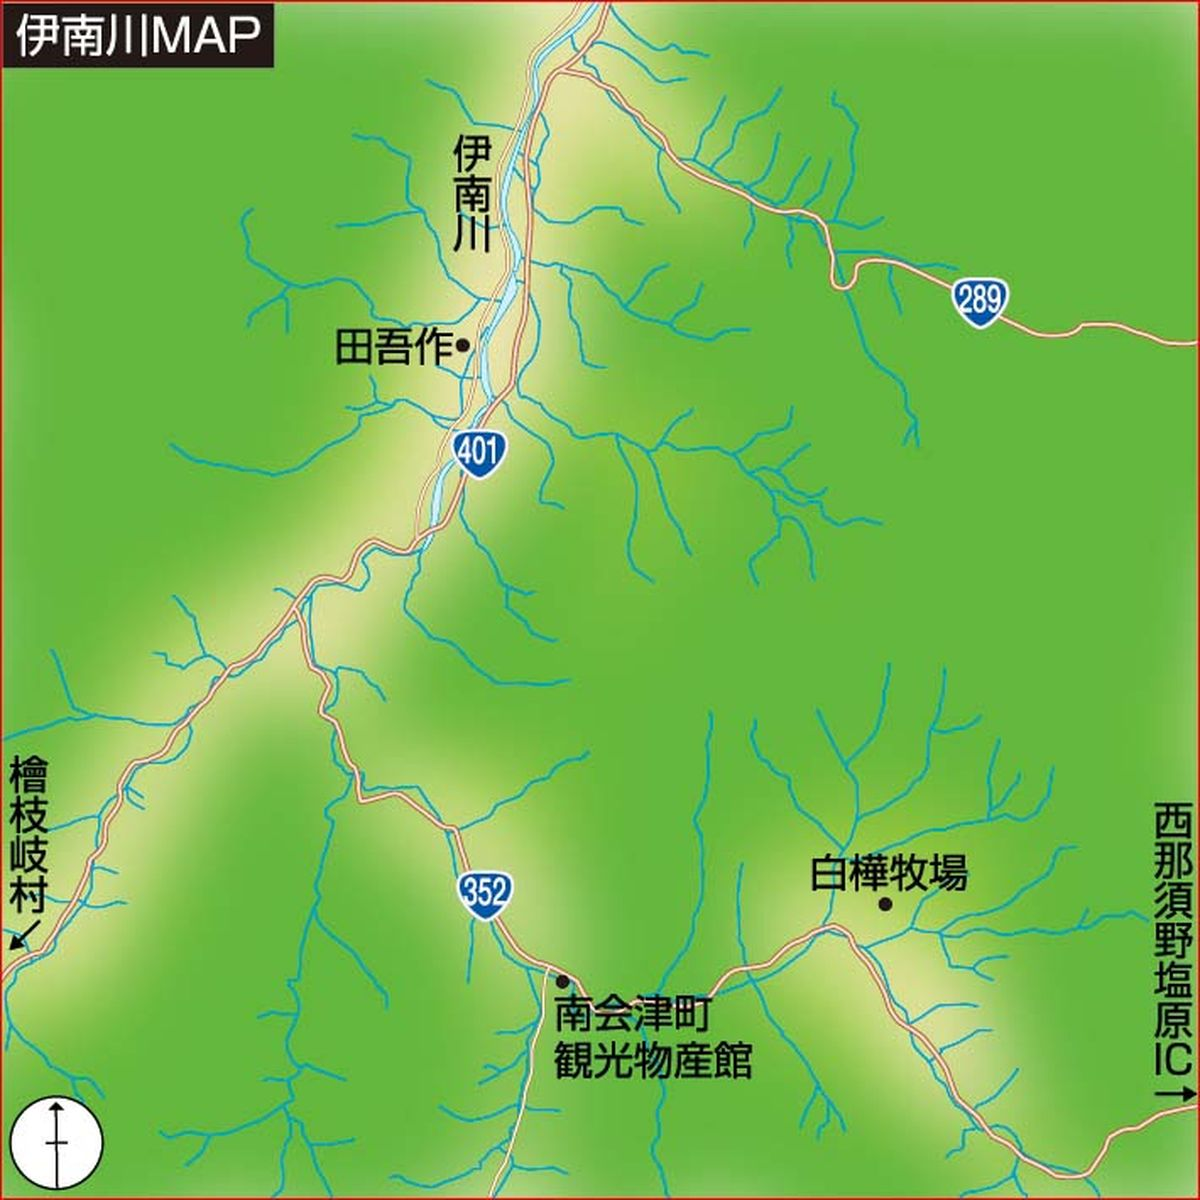 034-037inagawa_cs6 (1)